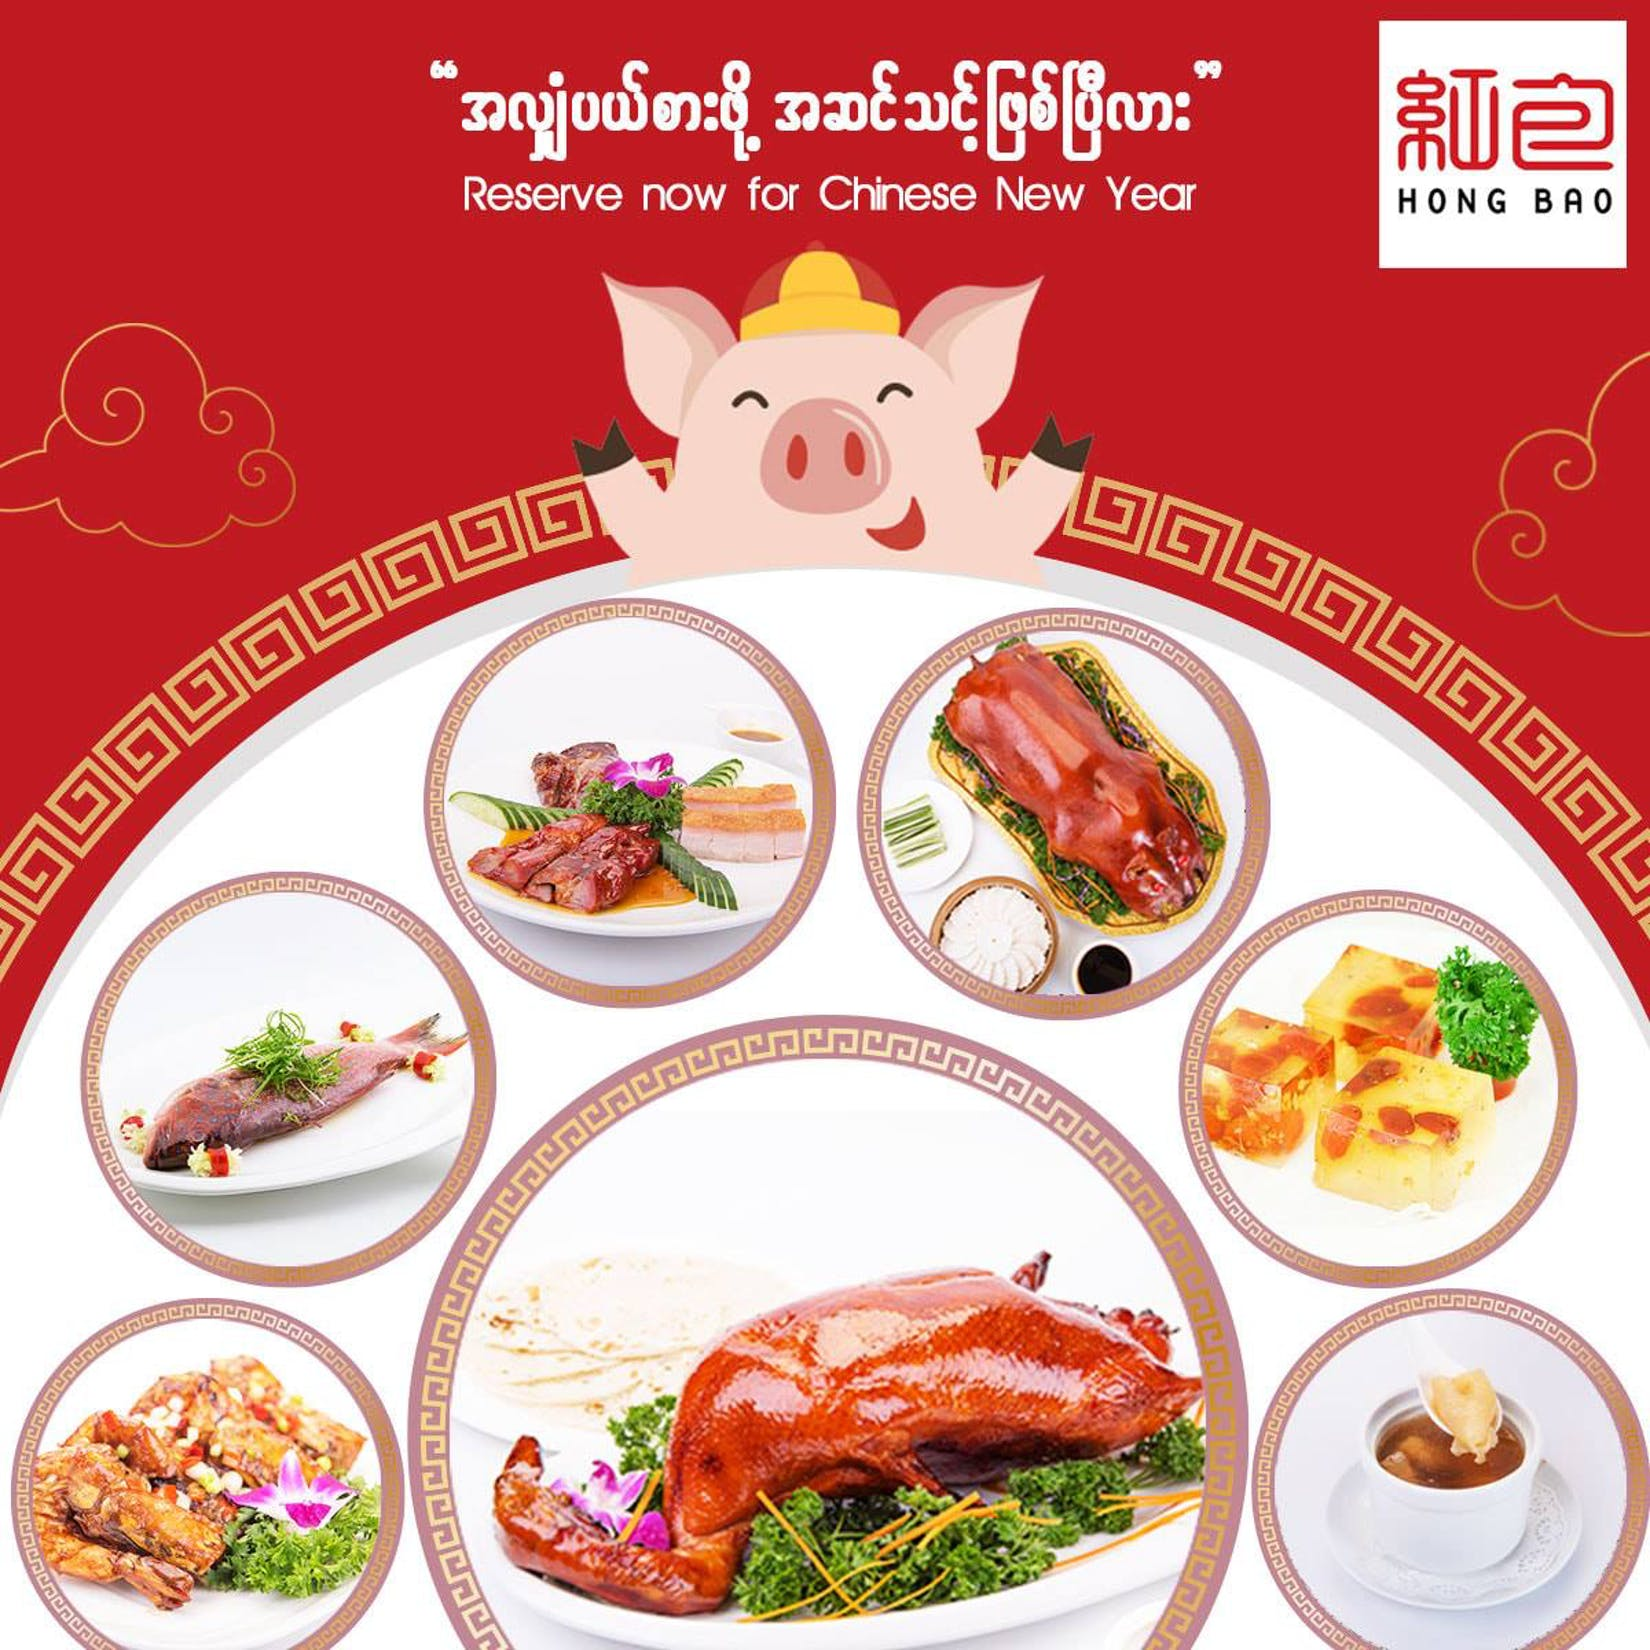 Hong Bao Dim Sum and Authentic Hong Kong Cuisine | yathar